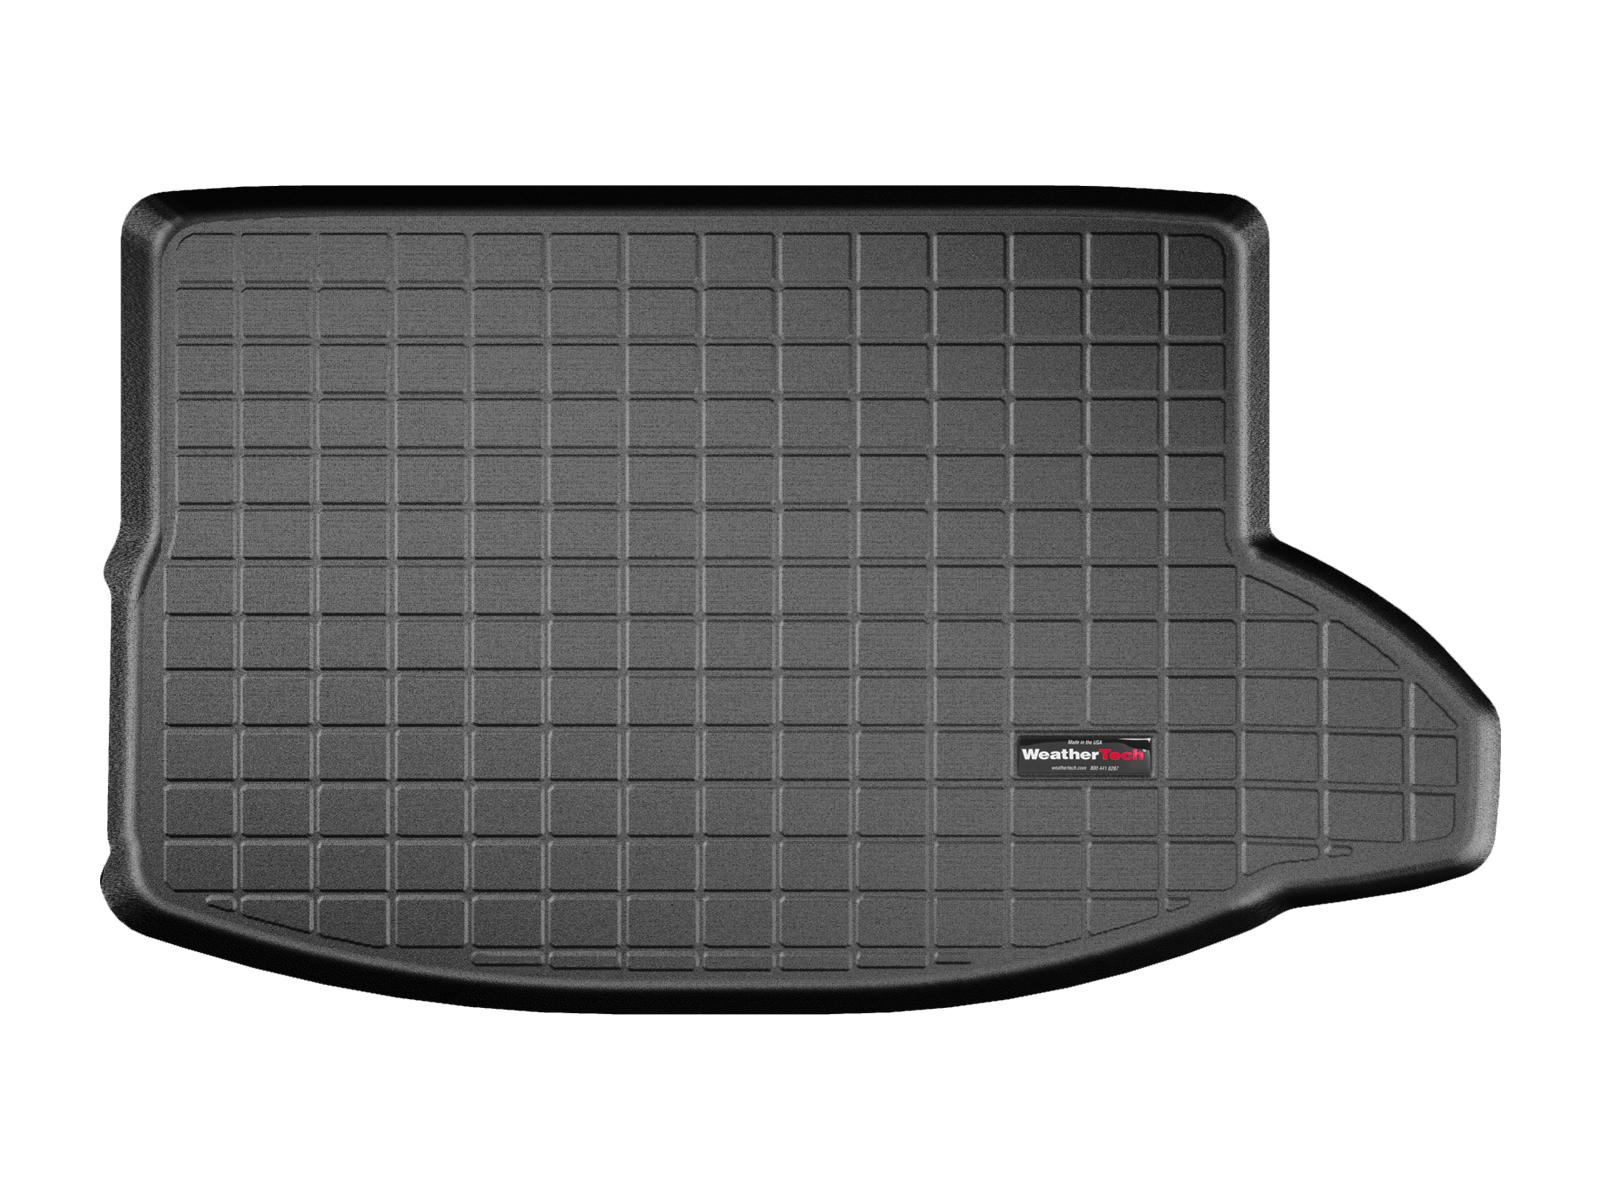 Audi A3 S3 2014>2017 Vasca proteggi baule tappeto bagagliaio nero *23